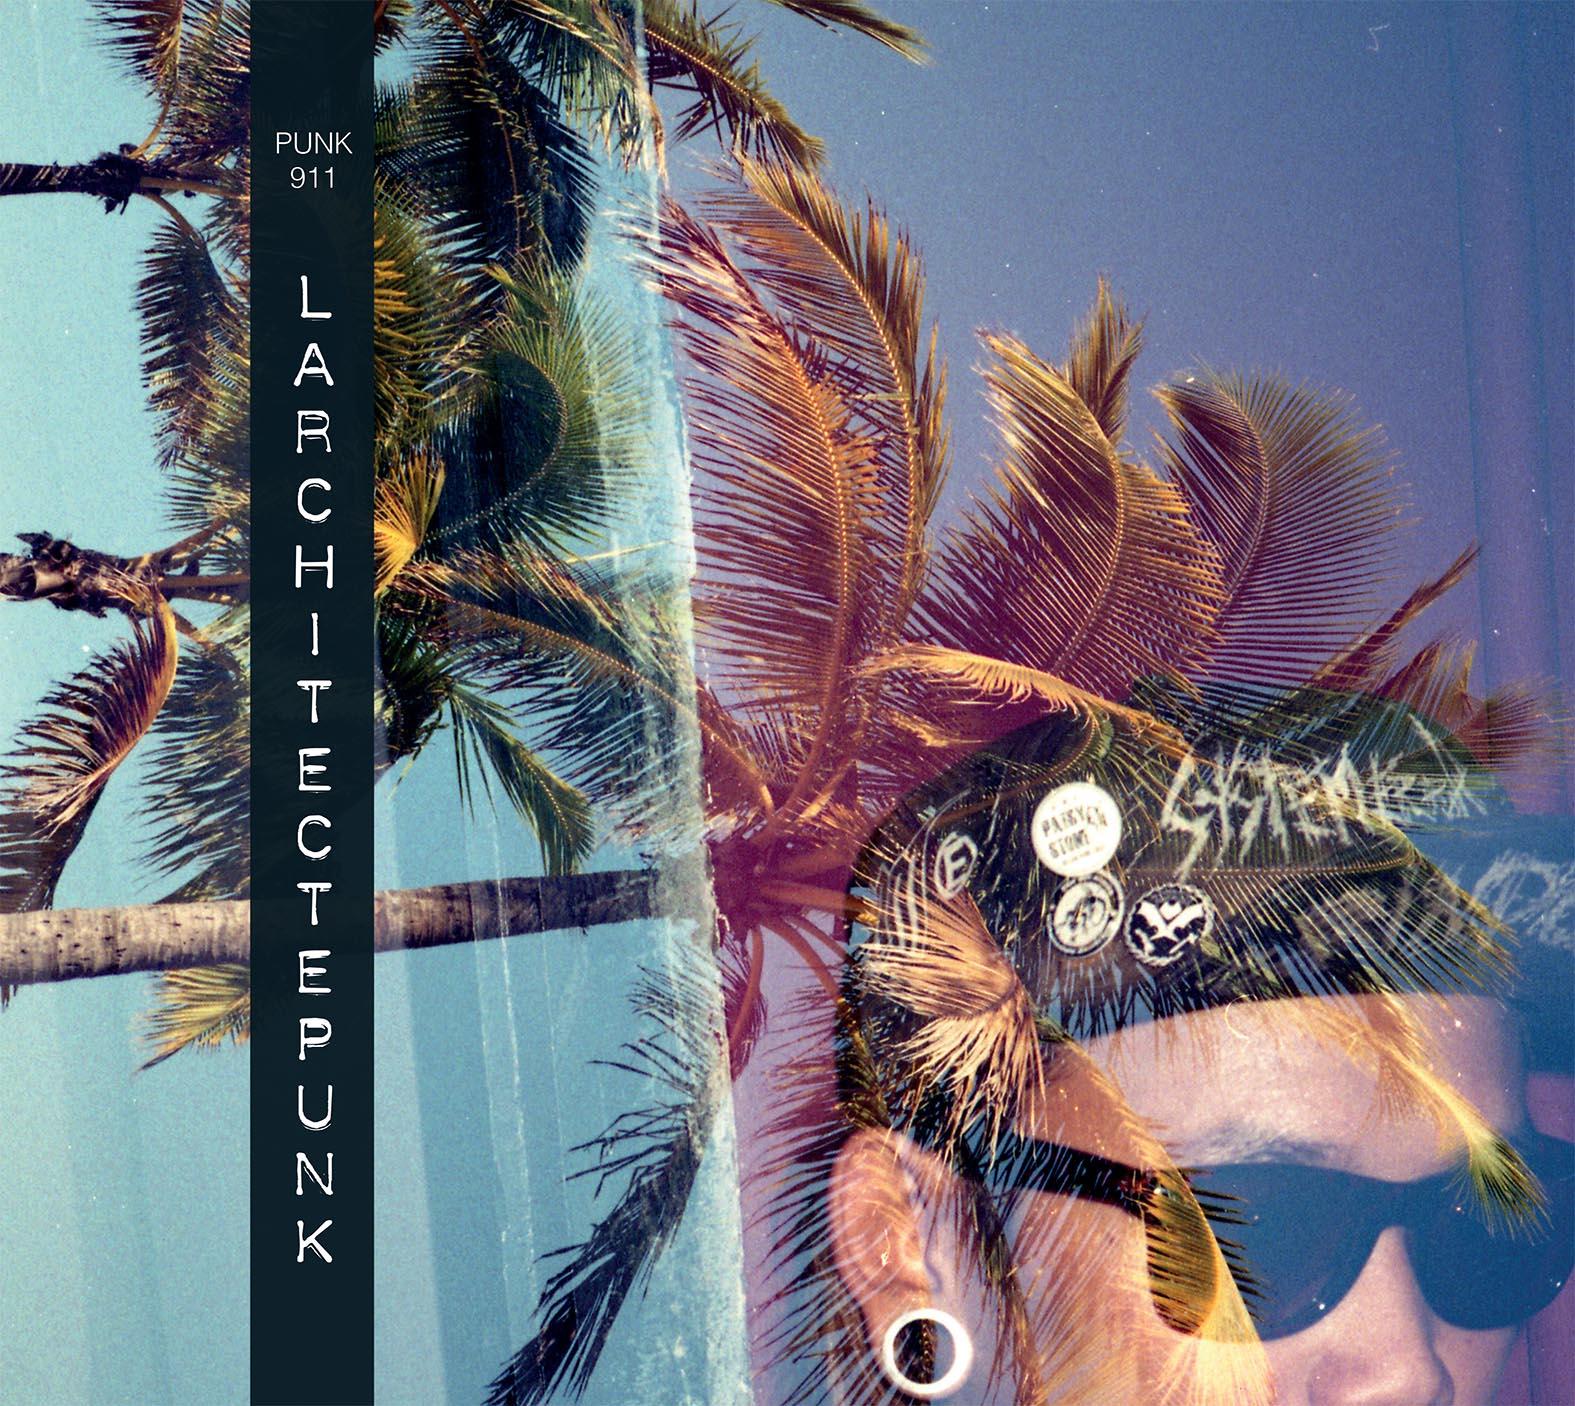 Djavanshir.n _ album cover _LARCHITECTEPUNK